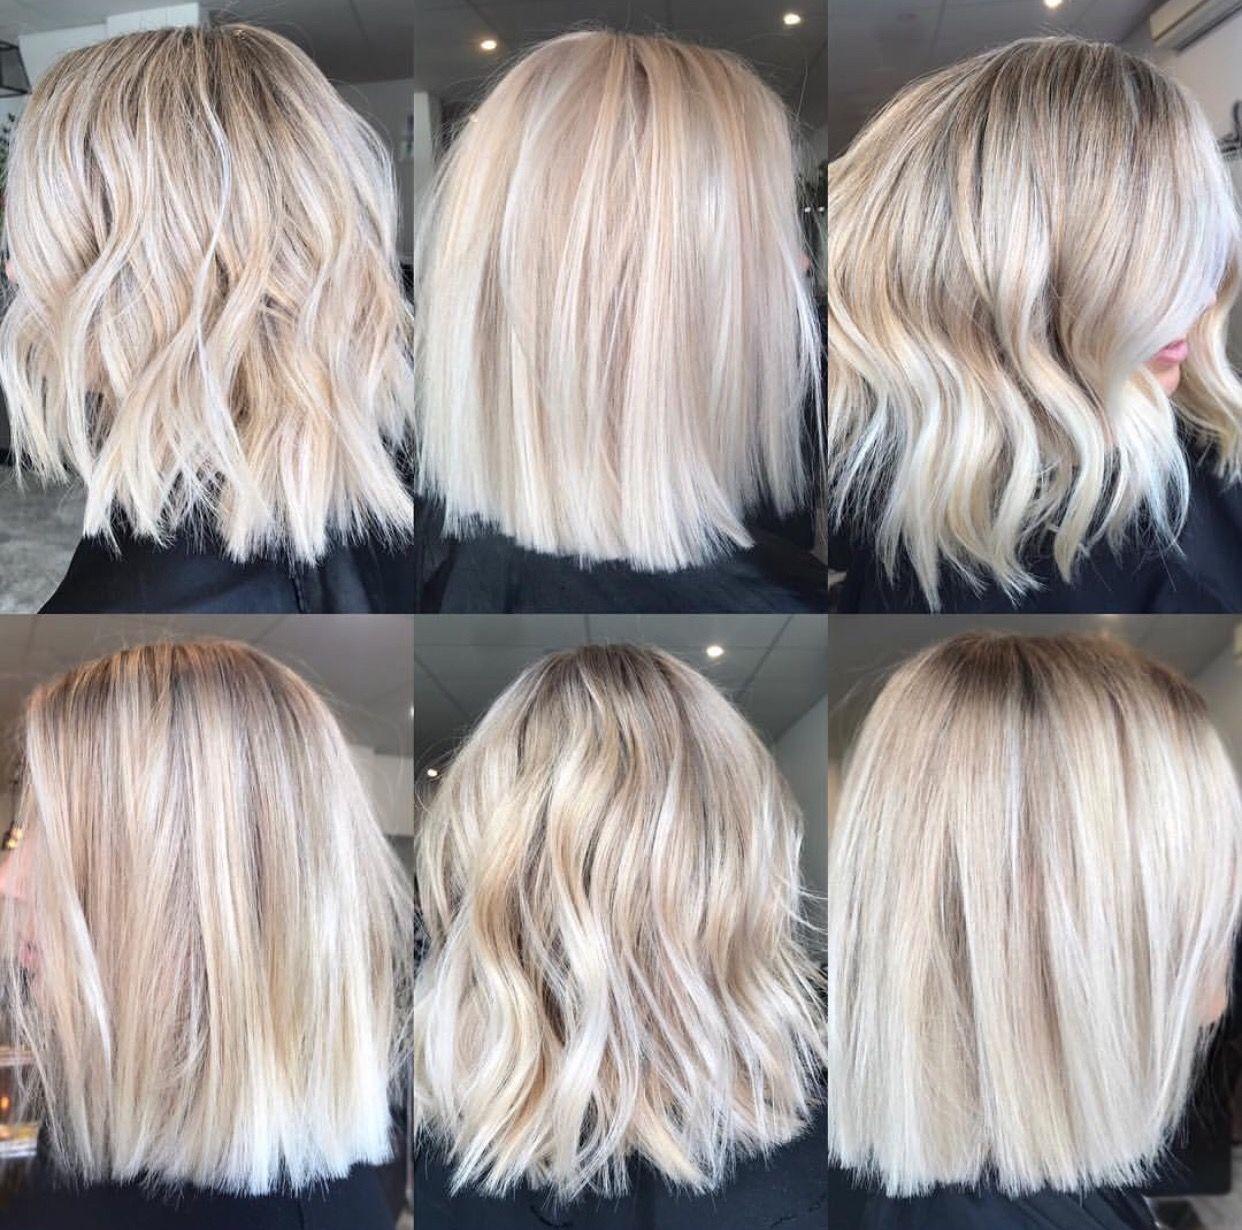 Blondessss #ashblondebalayage